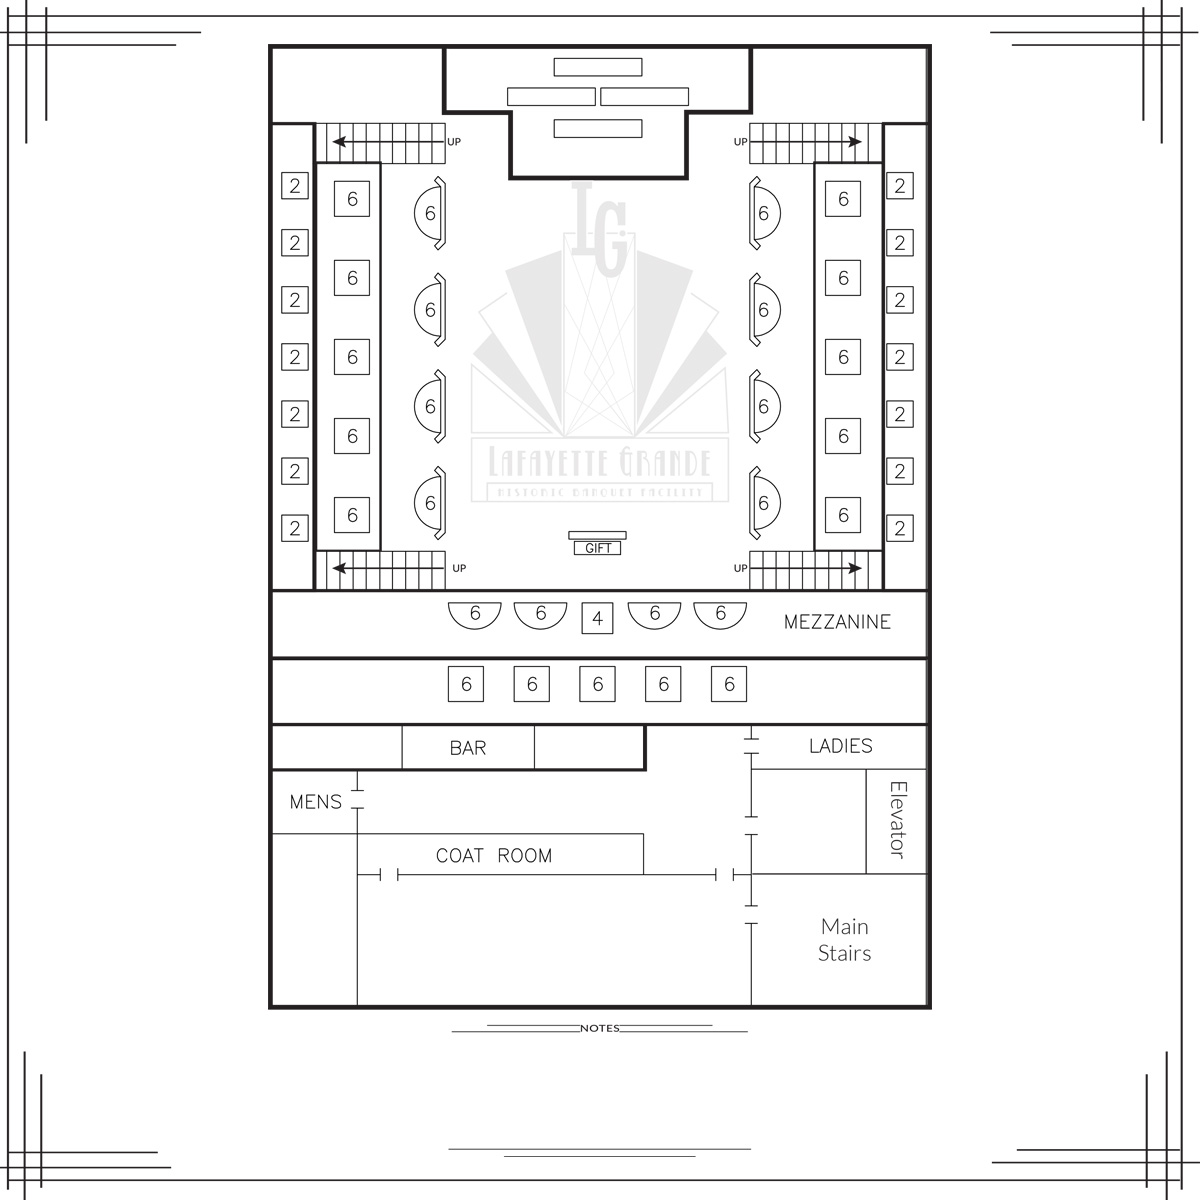 crystal ballroom floorplan